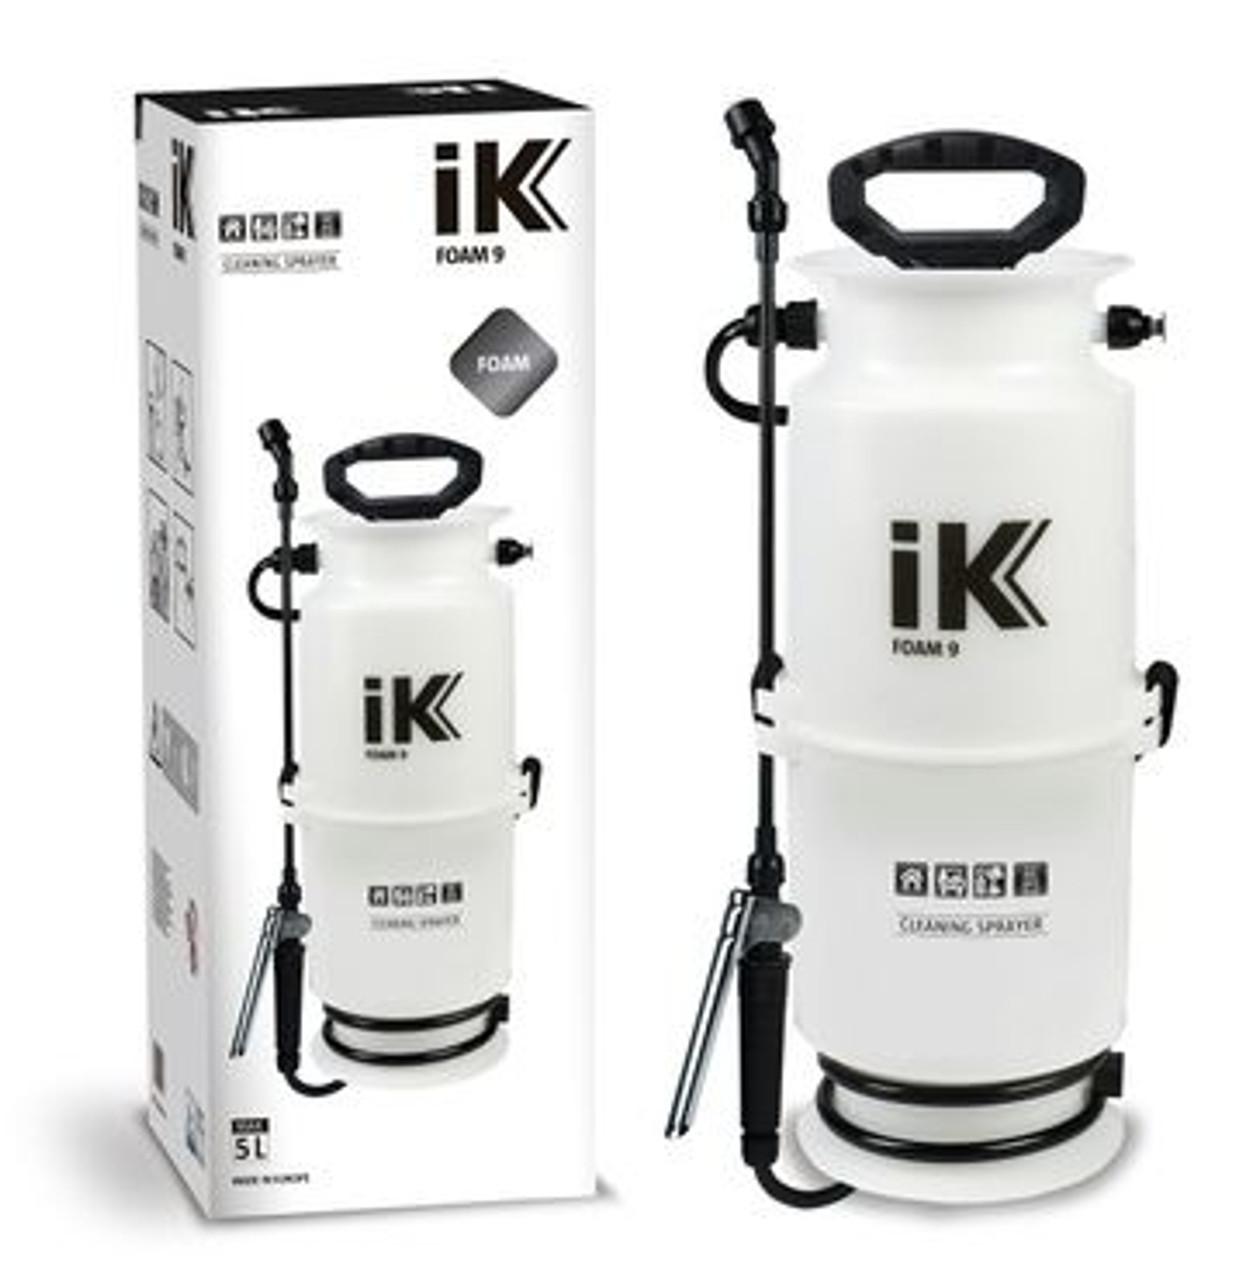 Car & Motorbike Care IK 9 FOAM SPRAYER Cleaning Kits